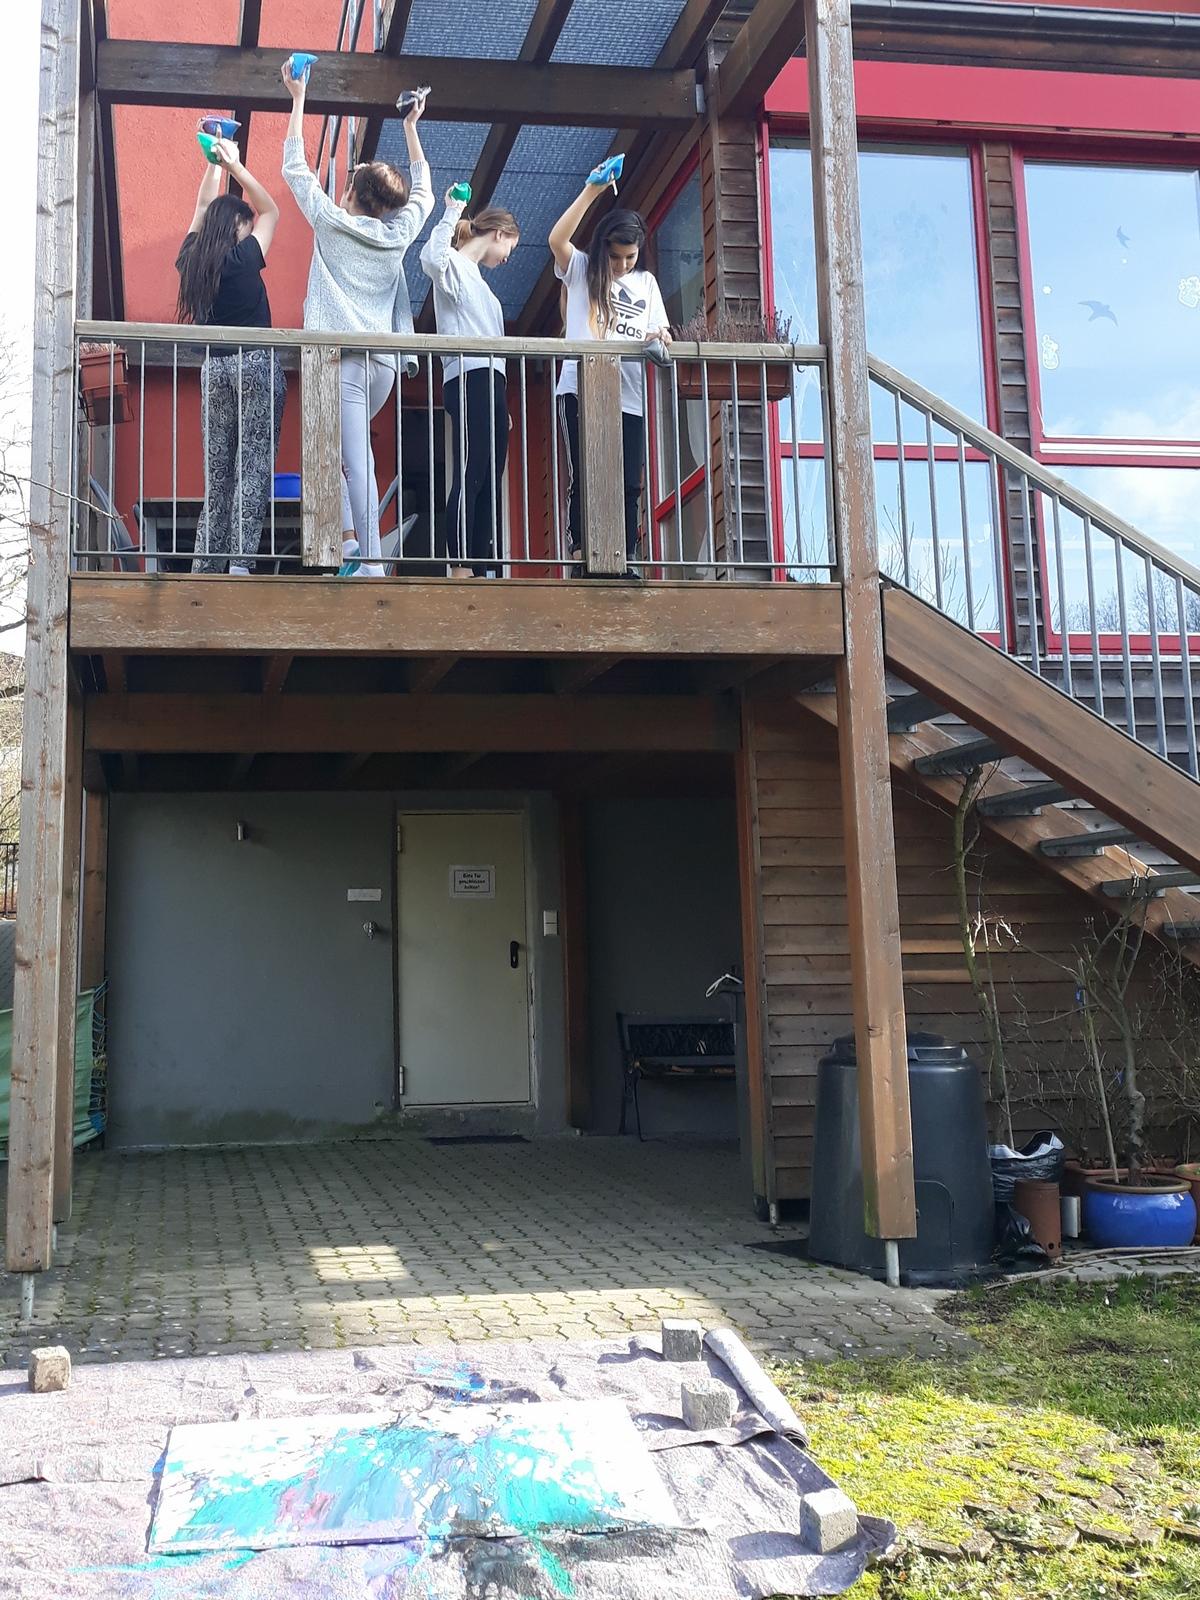 Heilpädagogische Mädchenwohngruppe Coburg vsj e.V. Jugendhilfe